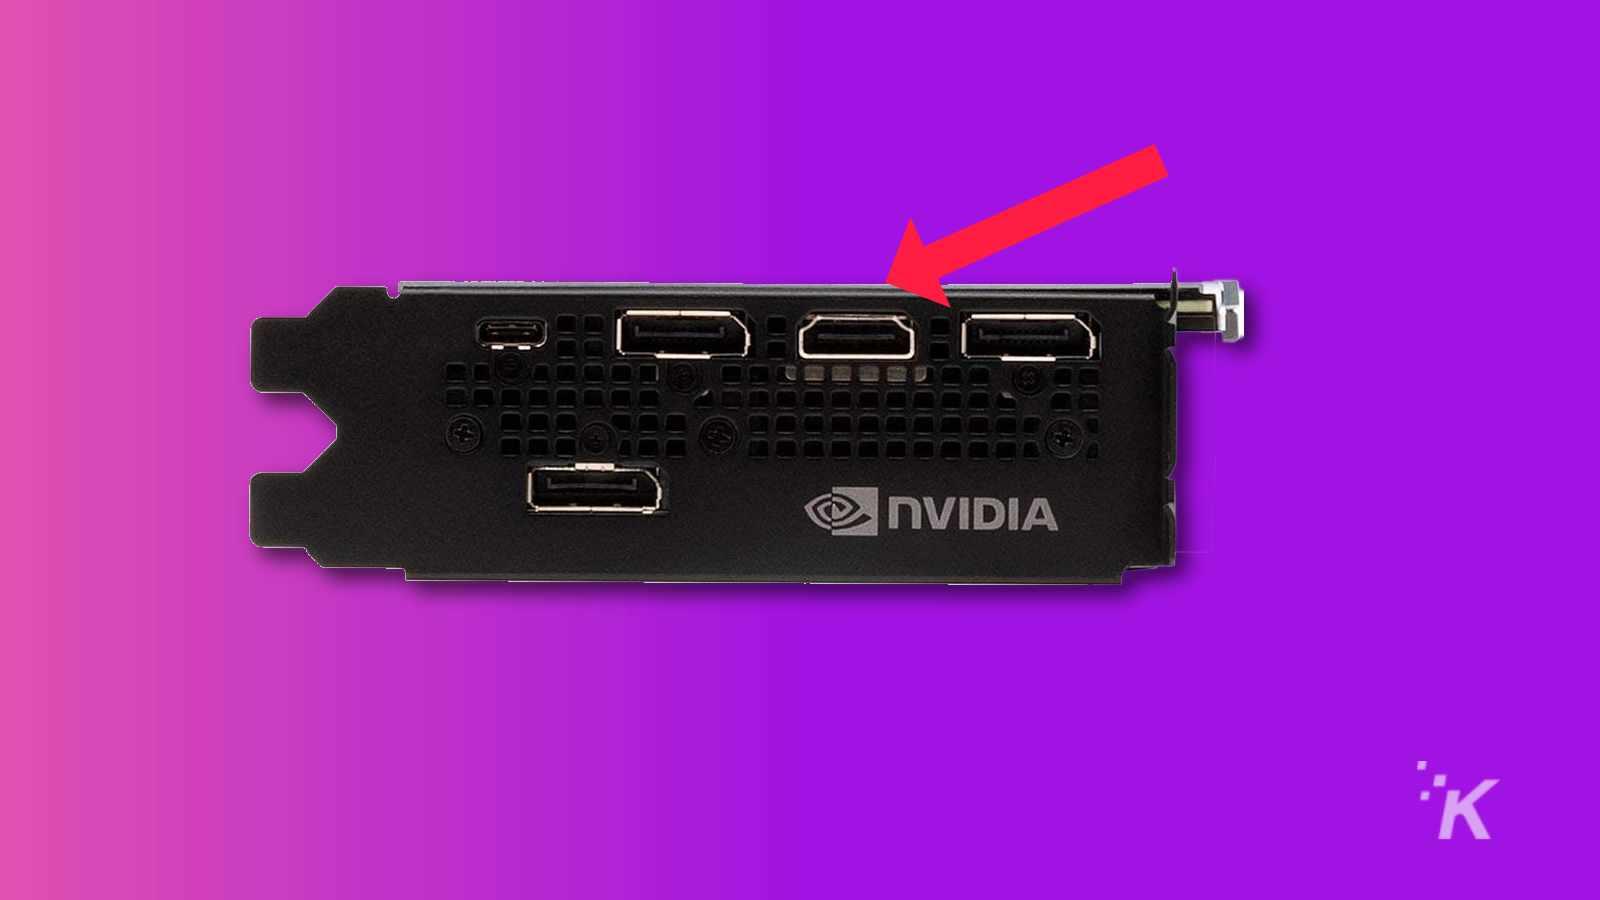 graphics card ports